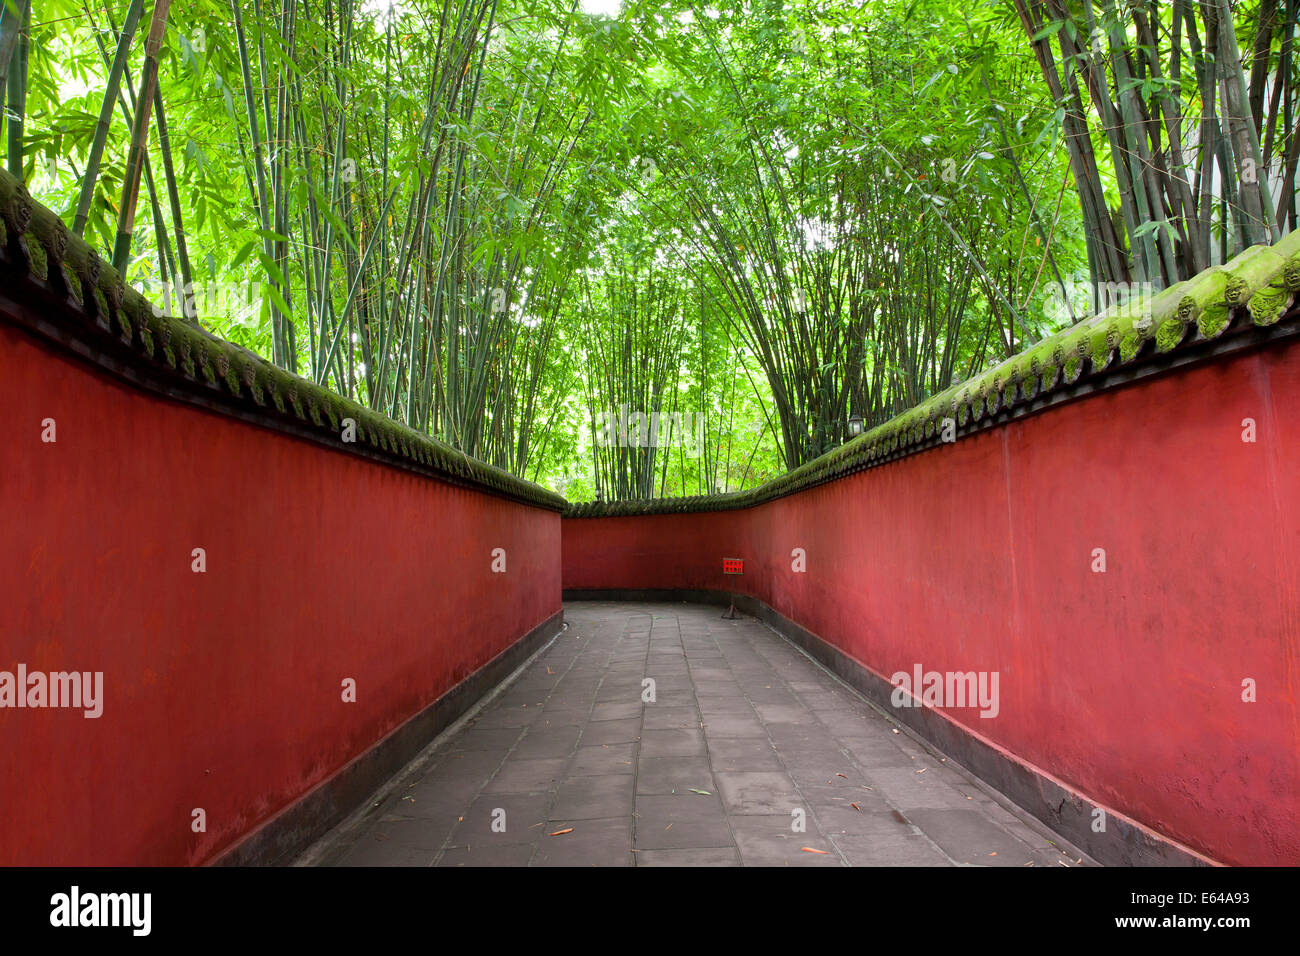 Avec bamboo Canopy Walkway, sanctuaire Wuhou, Chengdu, Sichuan, Chine Photo Stock